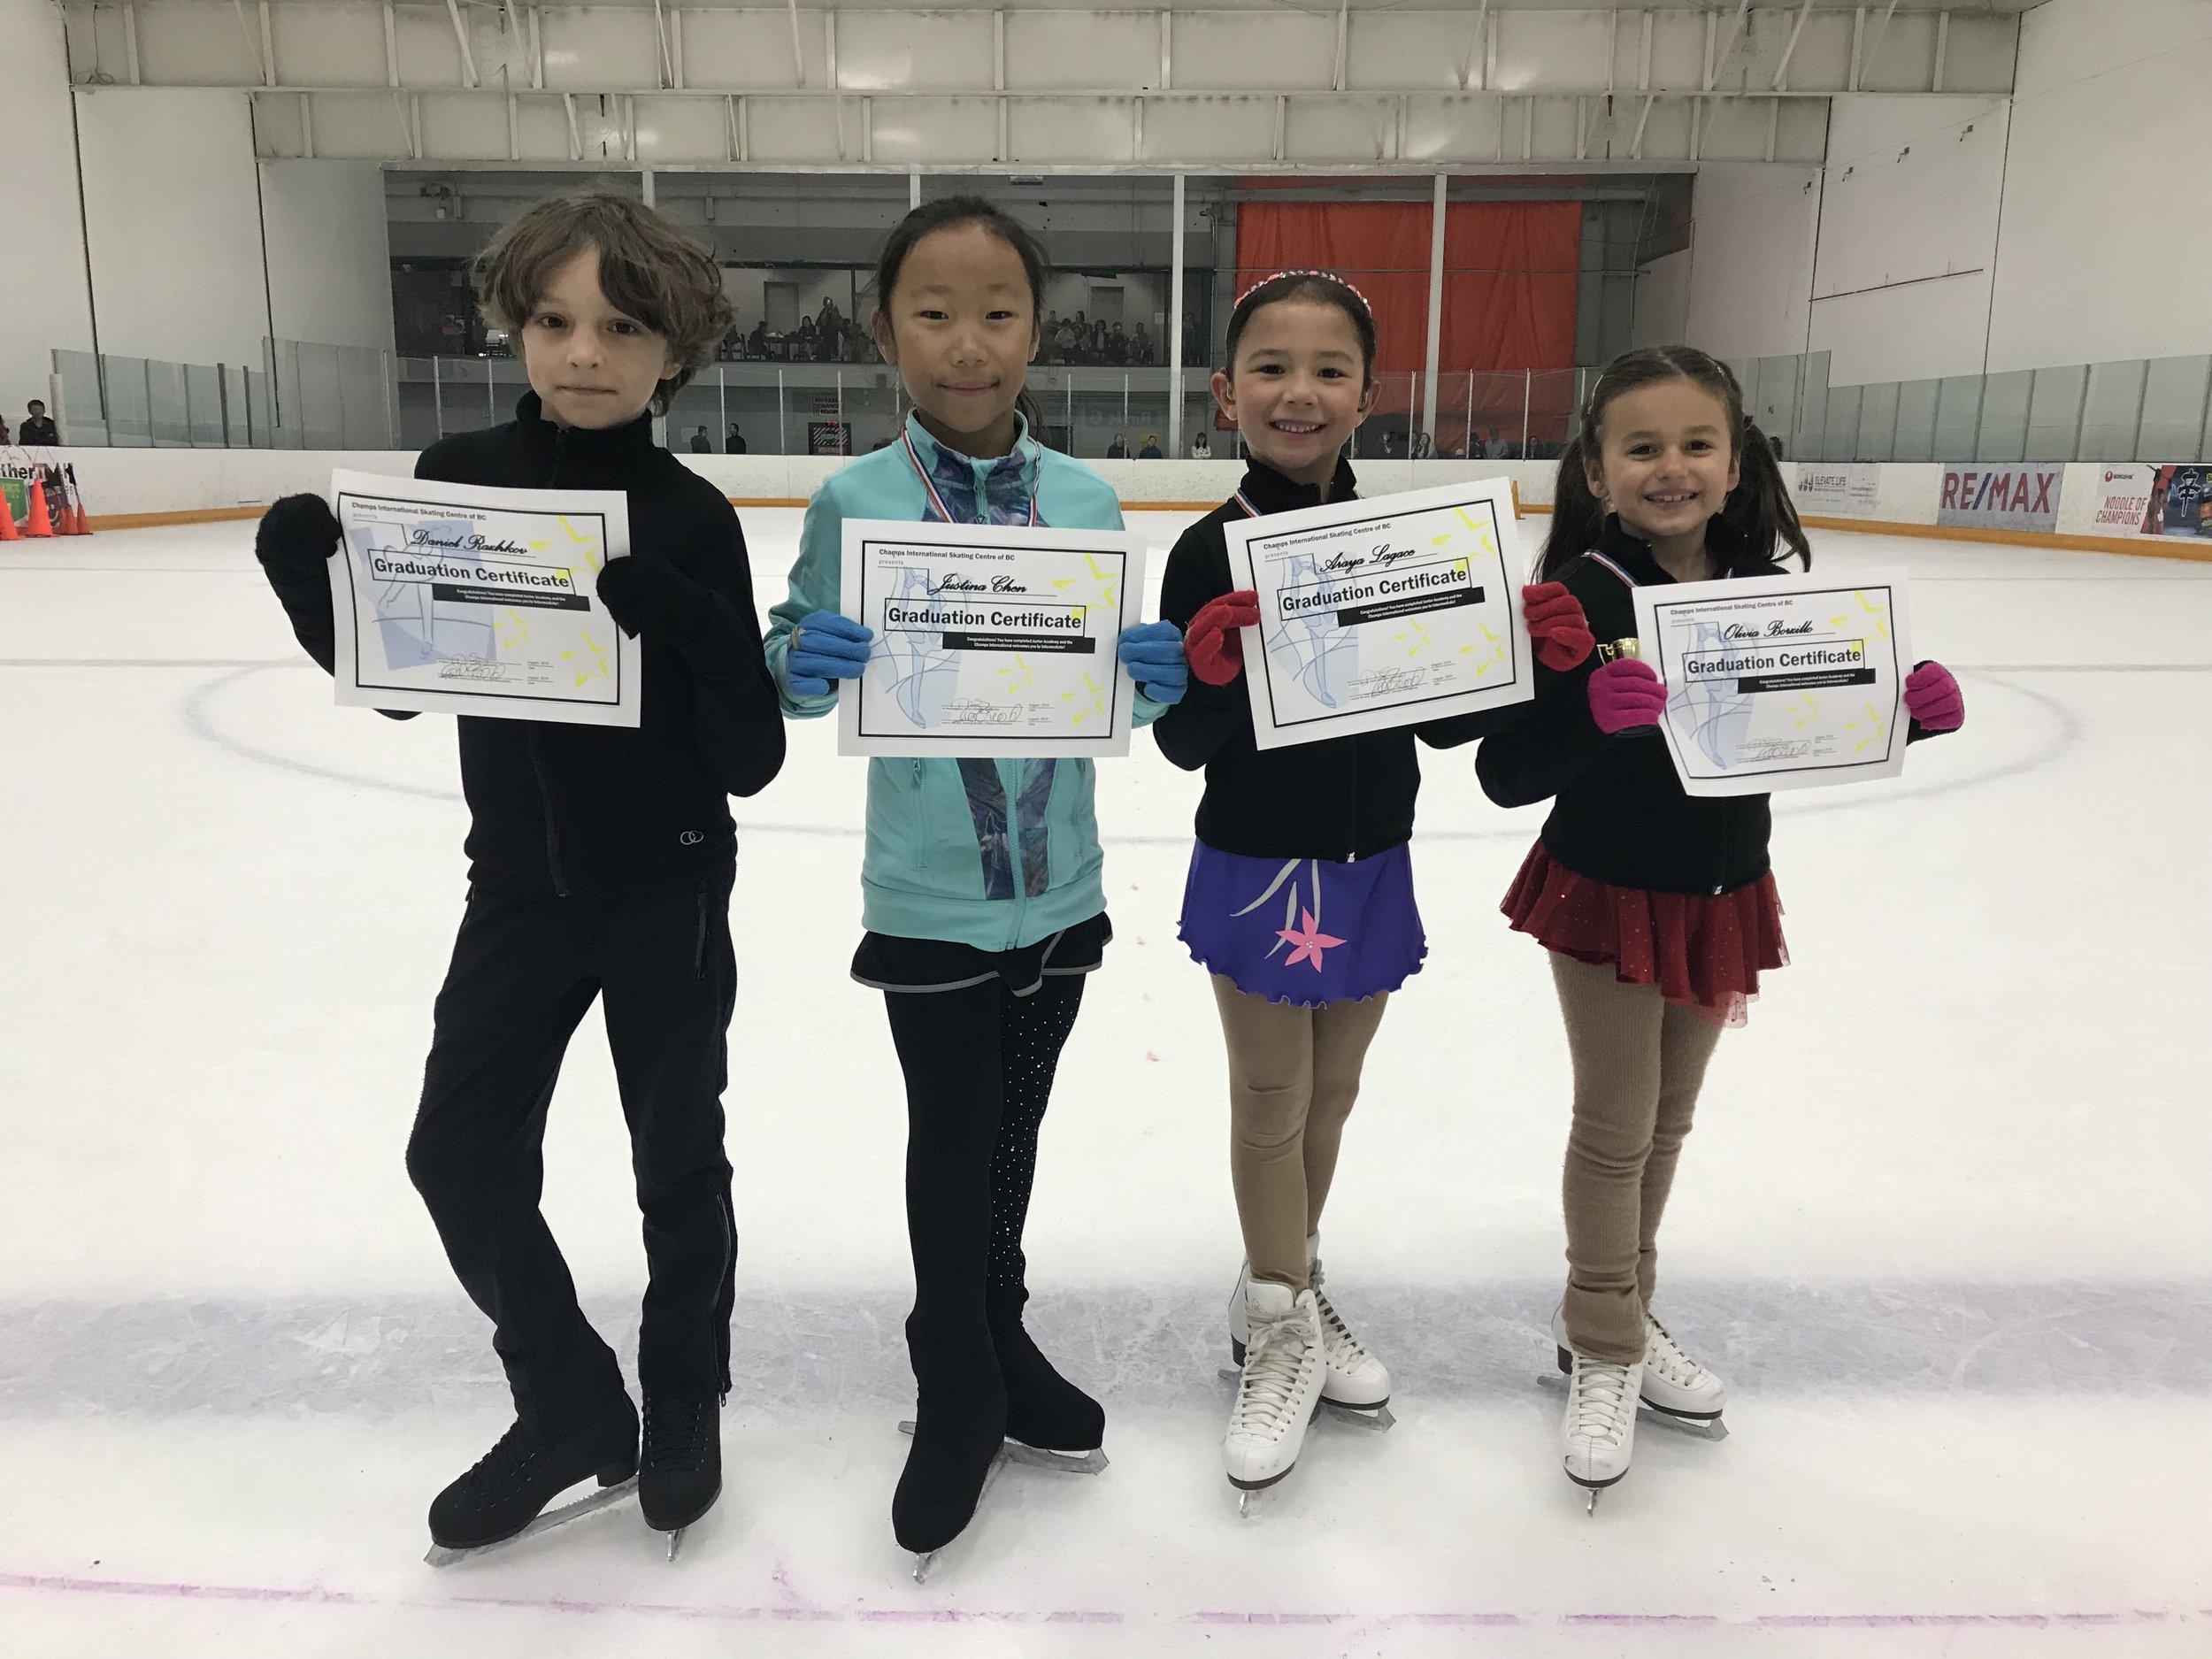 August 2019 (L: Daniel, Justina, Araya & Olivia (absent: Blaire))